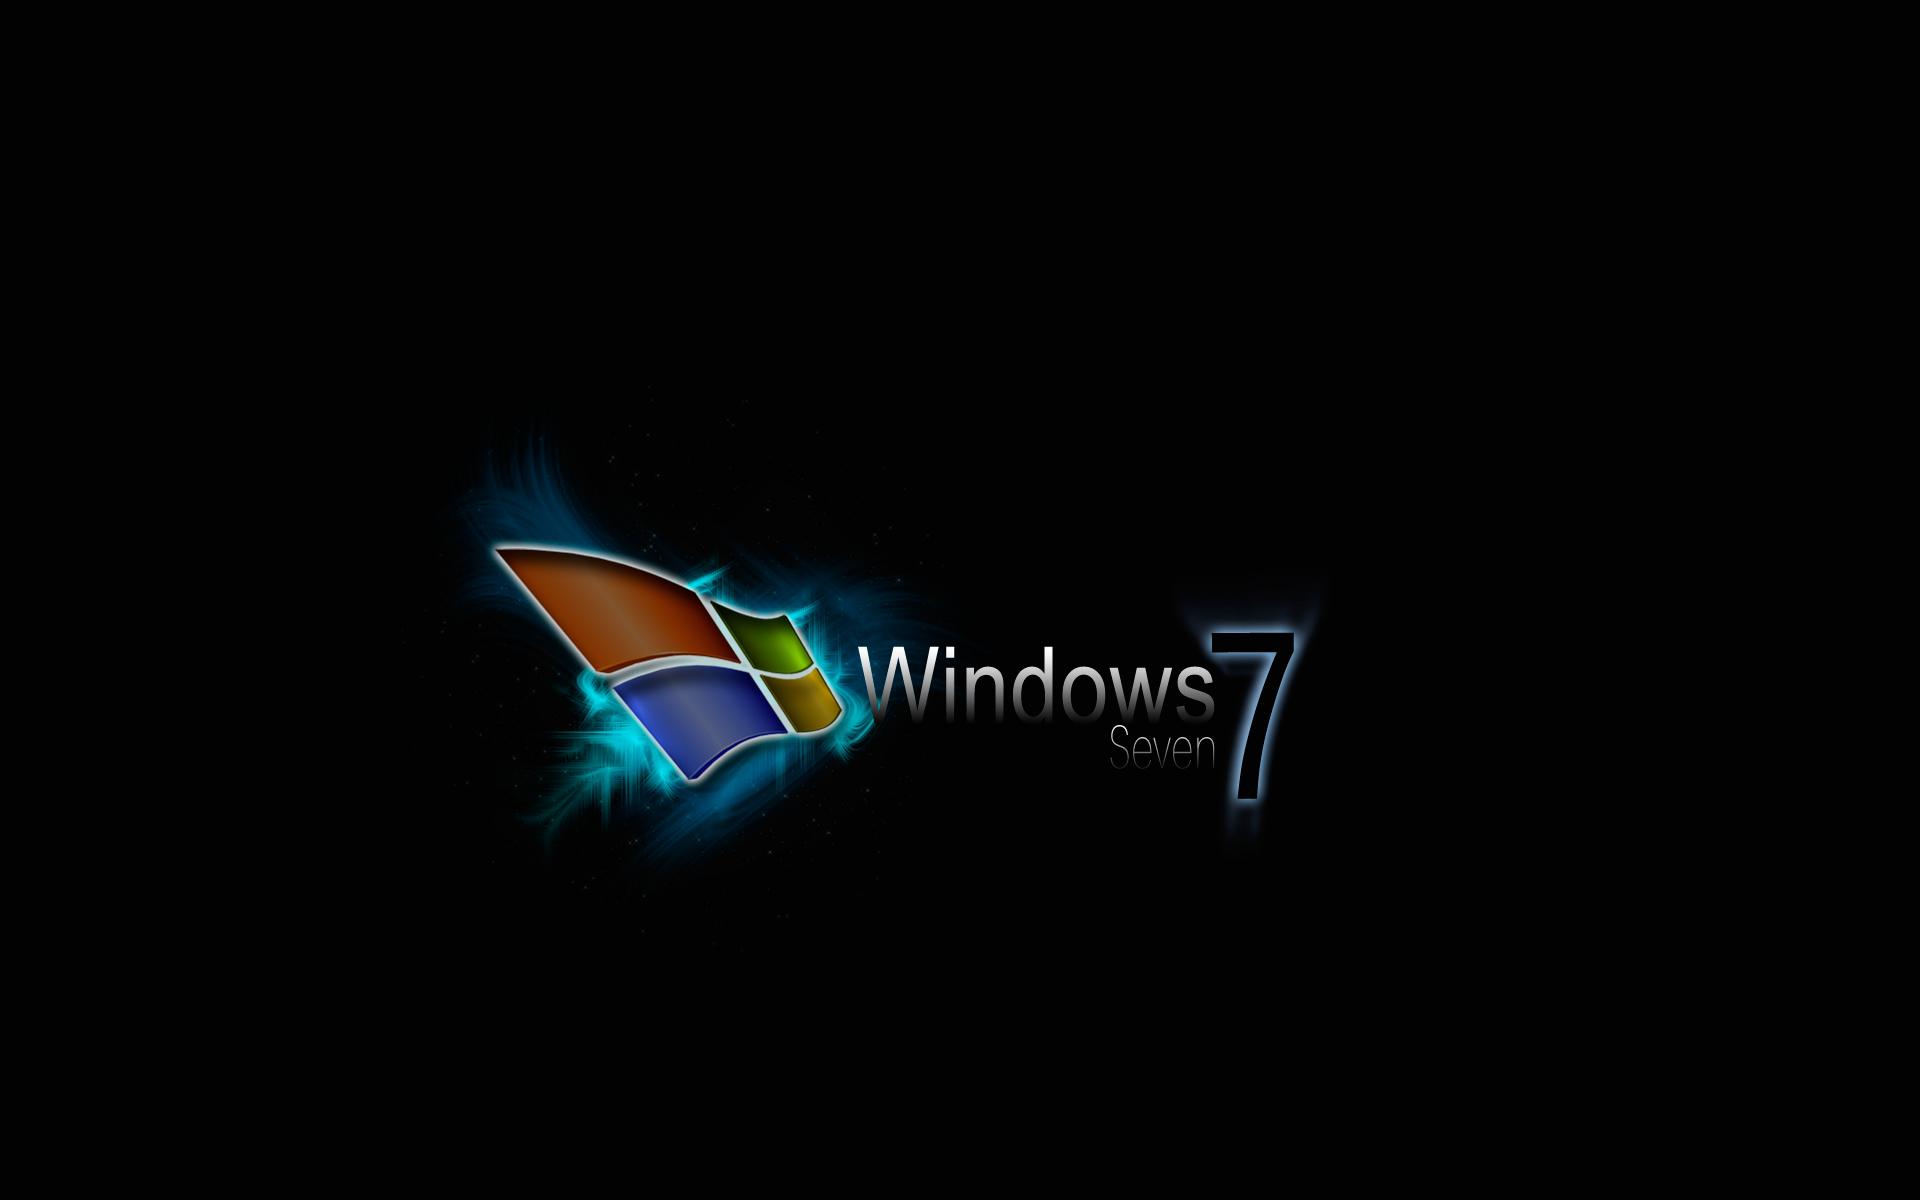 free windows 7 wallpapers - wallpapersafari